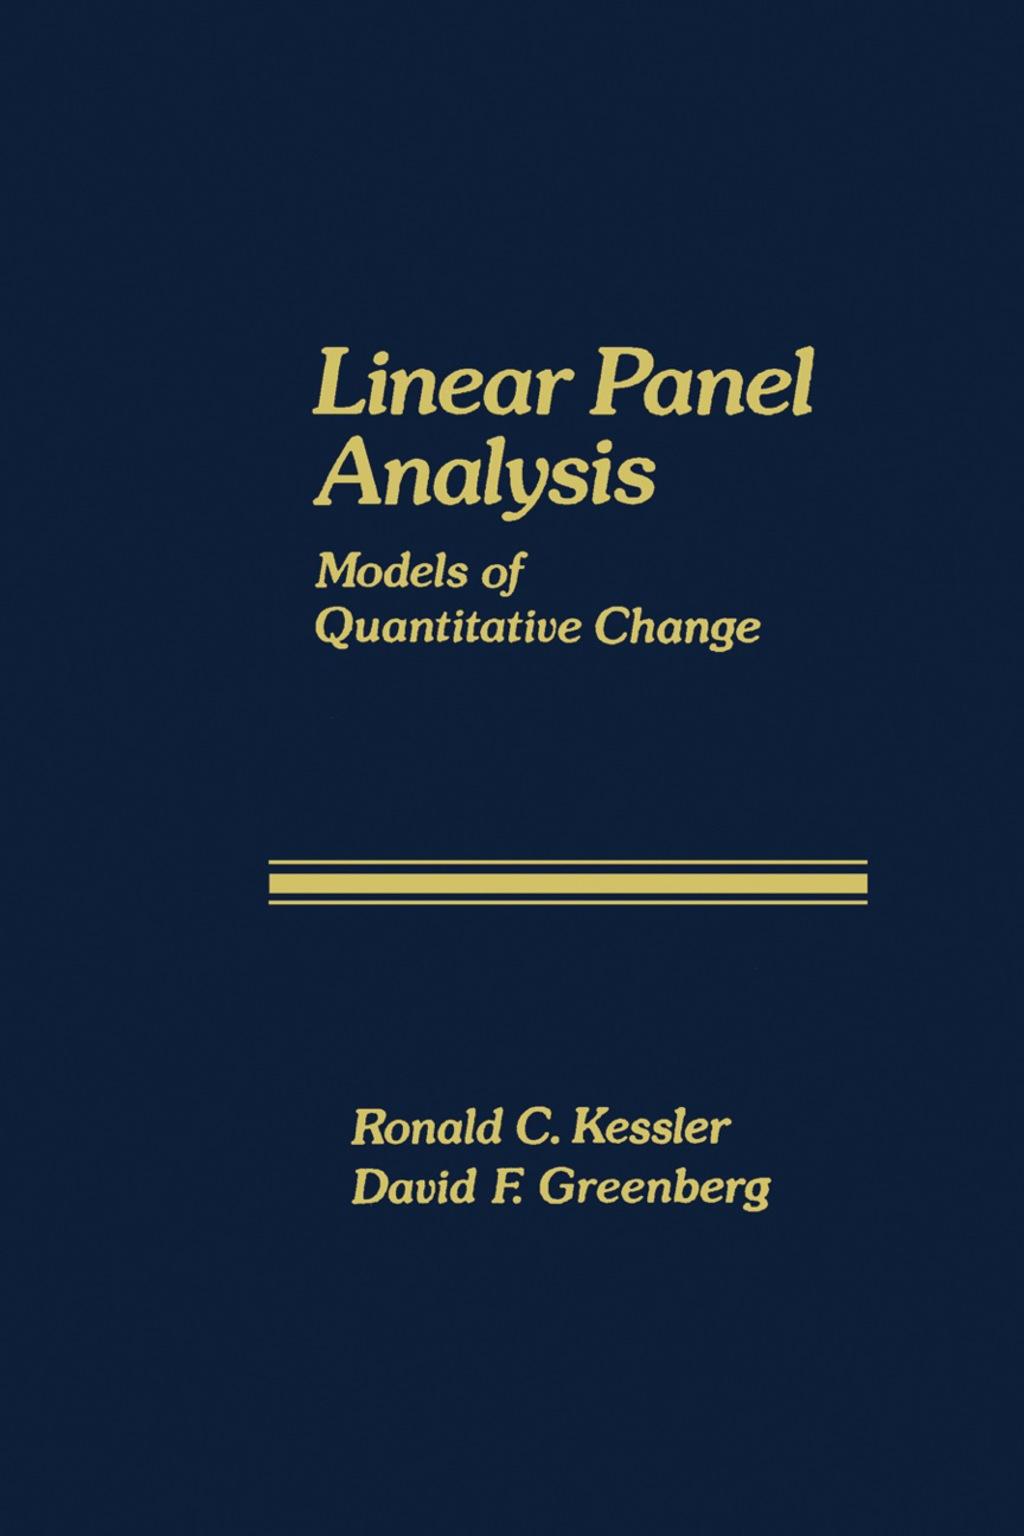 Linear Panel Analysis (eBook)